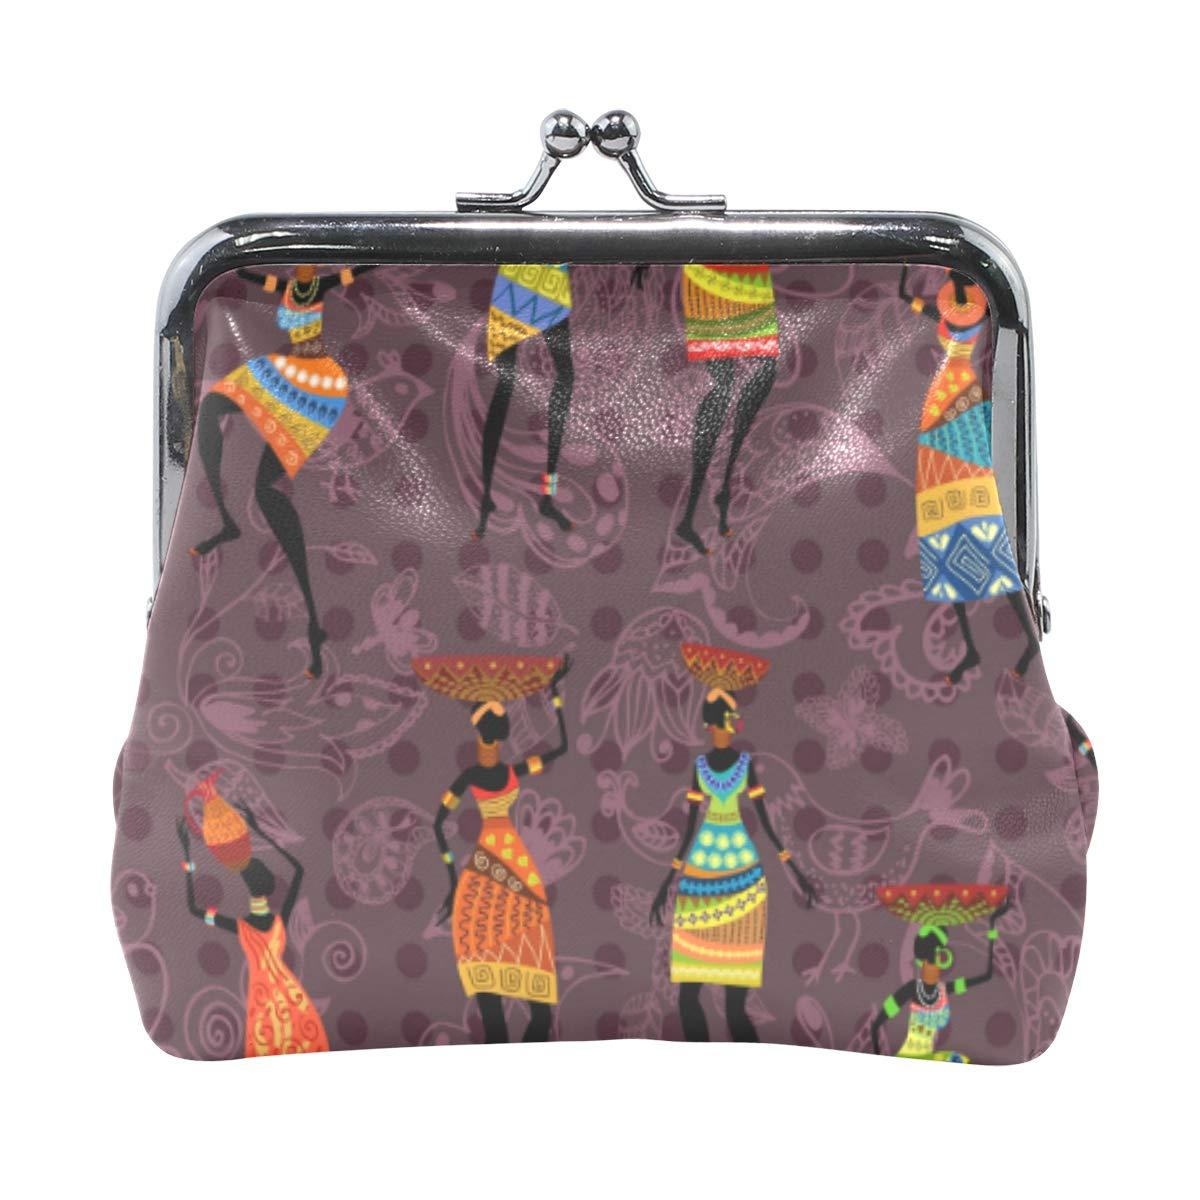 Fashion Womens Coin Purse Retro African Women Vintage Vintage Pouch Mini Purse Wallets